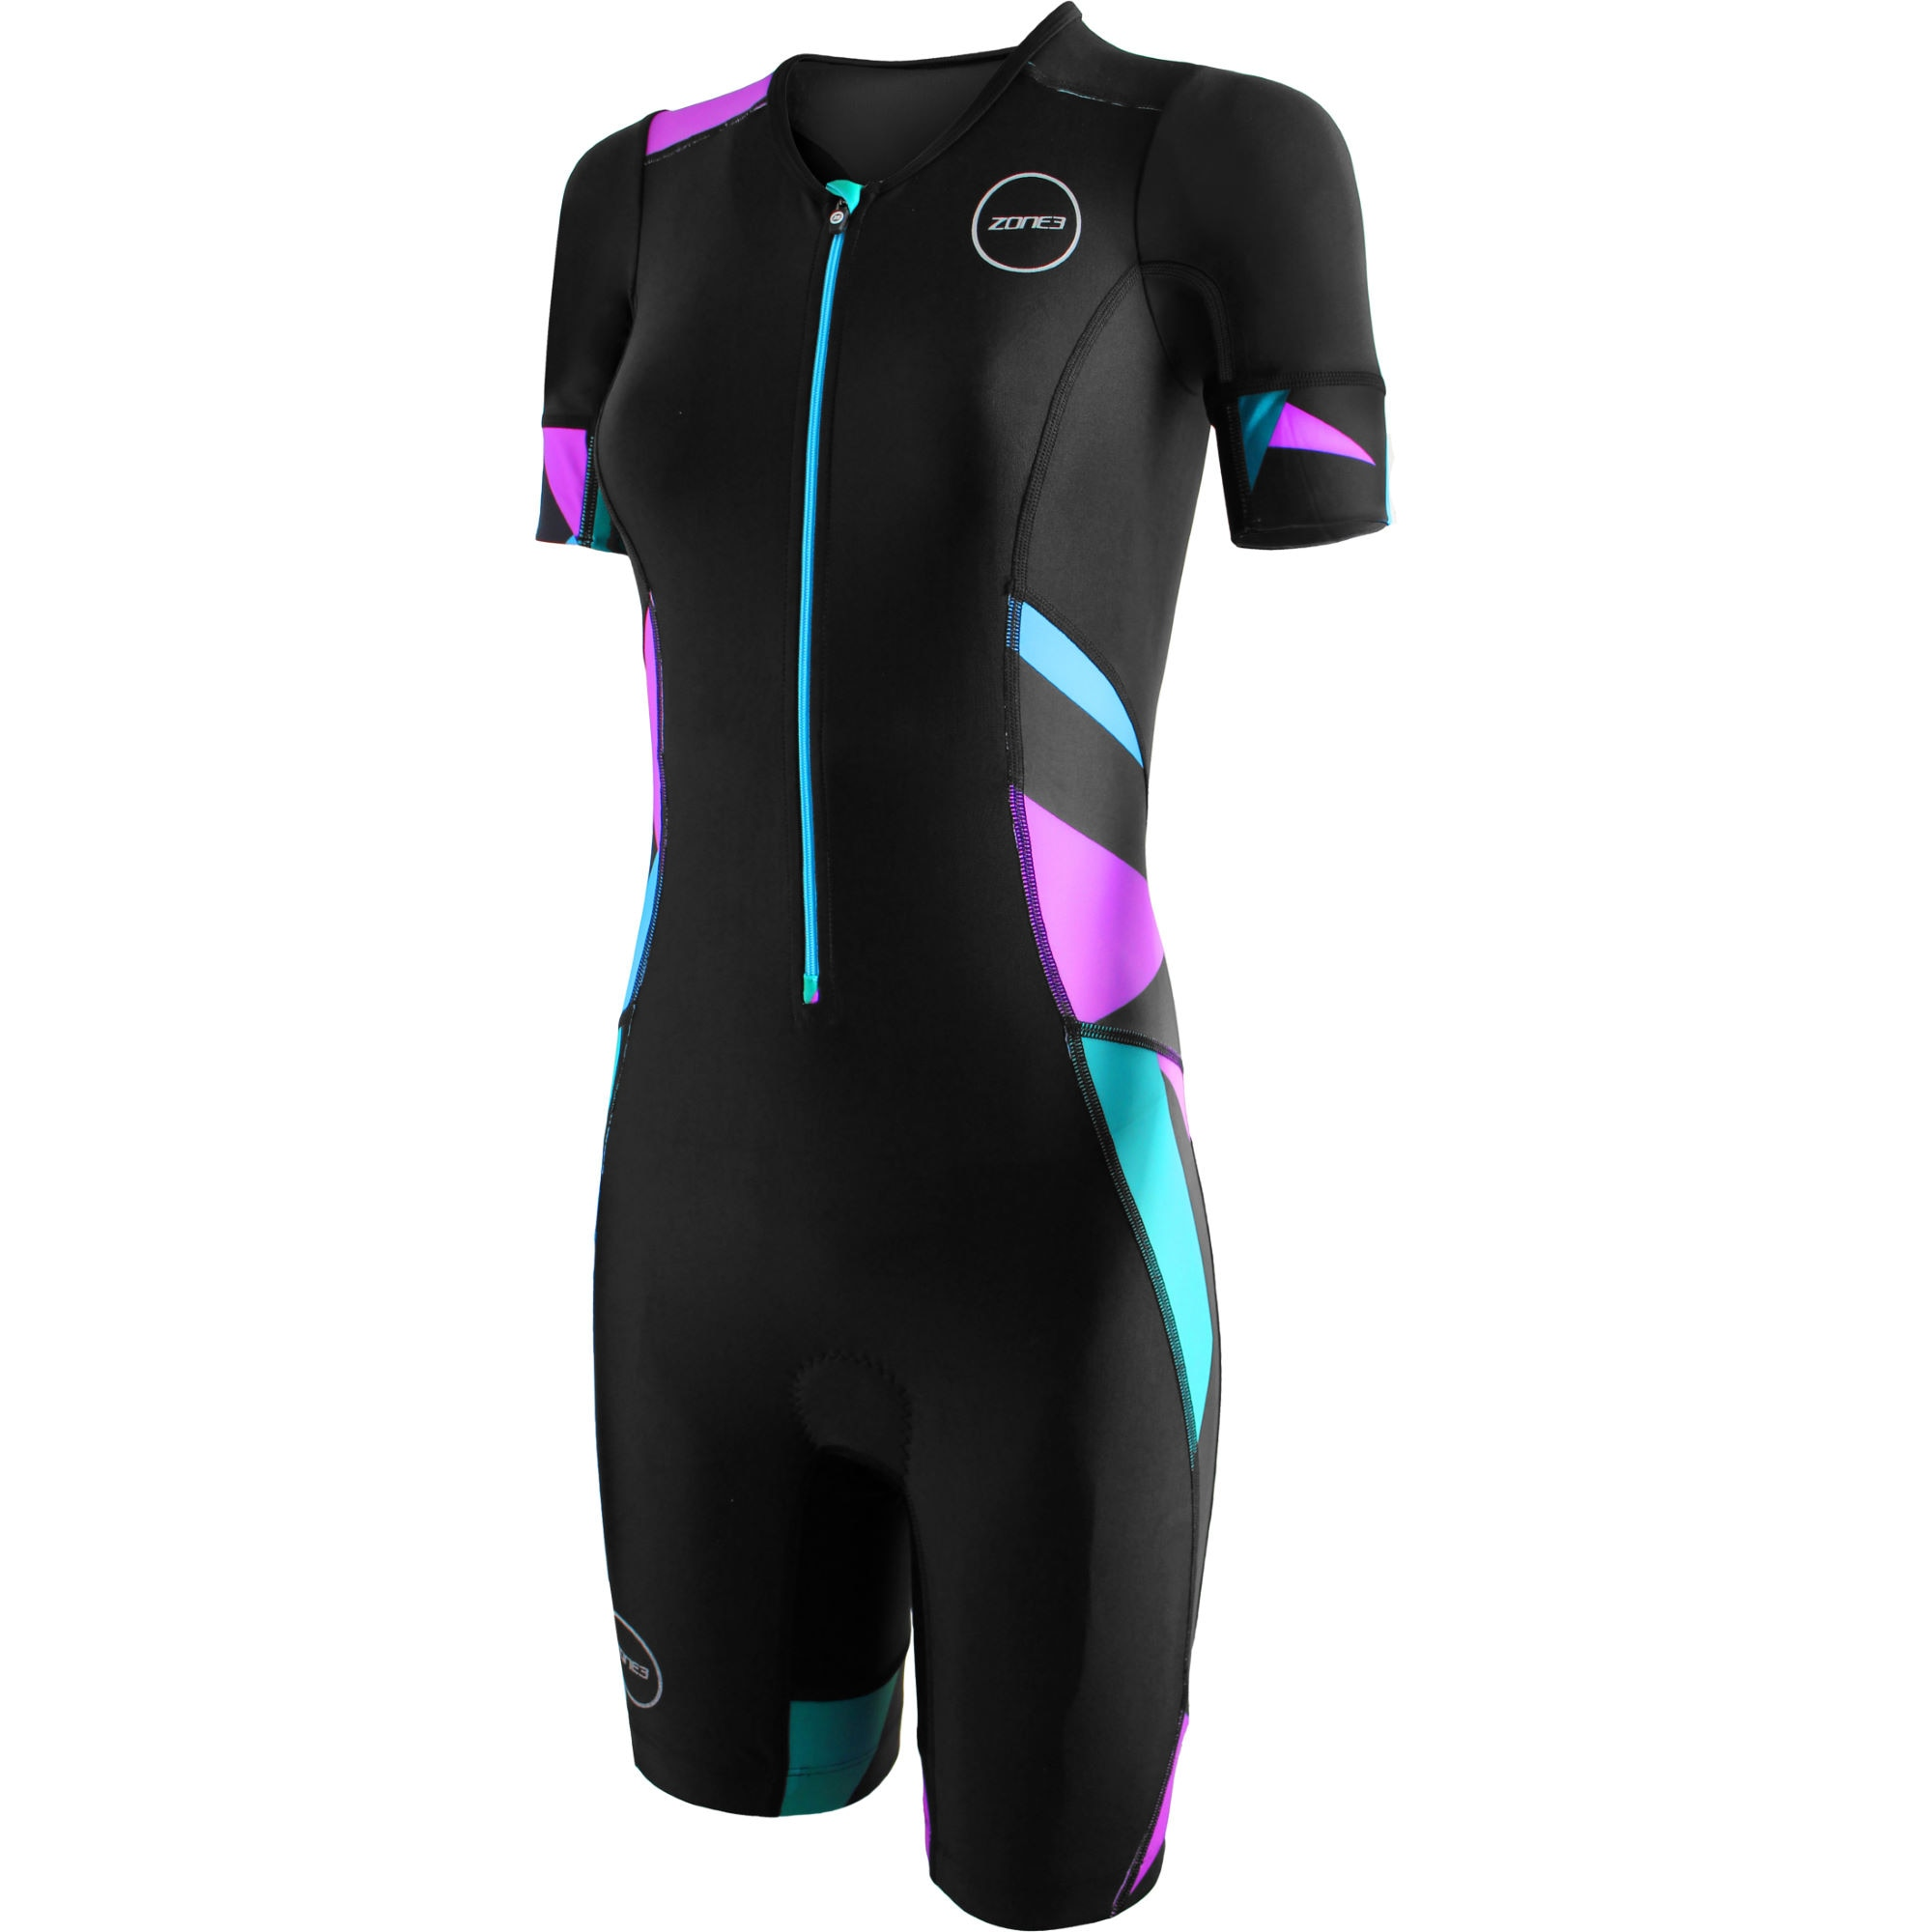 2019 Zone3 mujeres skinsuit triatlón sexy body ciclismo jersey Maillot ciclismo ropa go pro equipo ciclismo traje de esquí